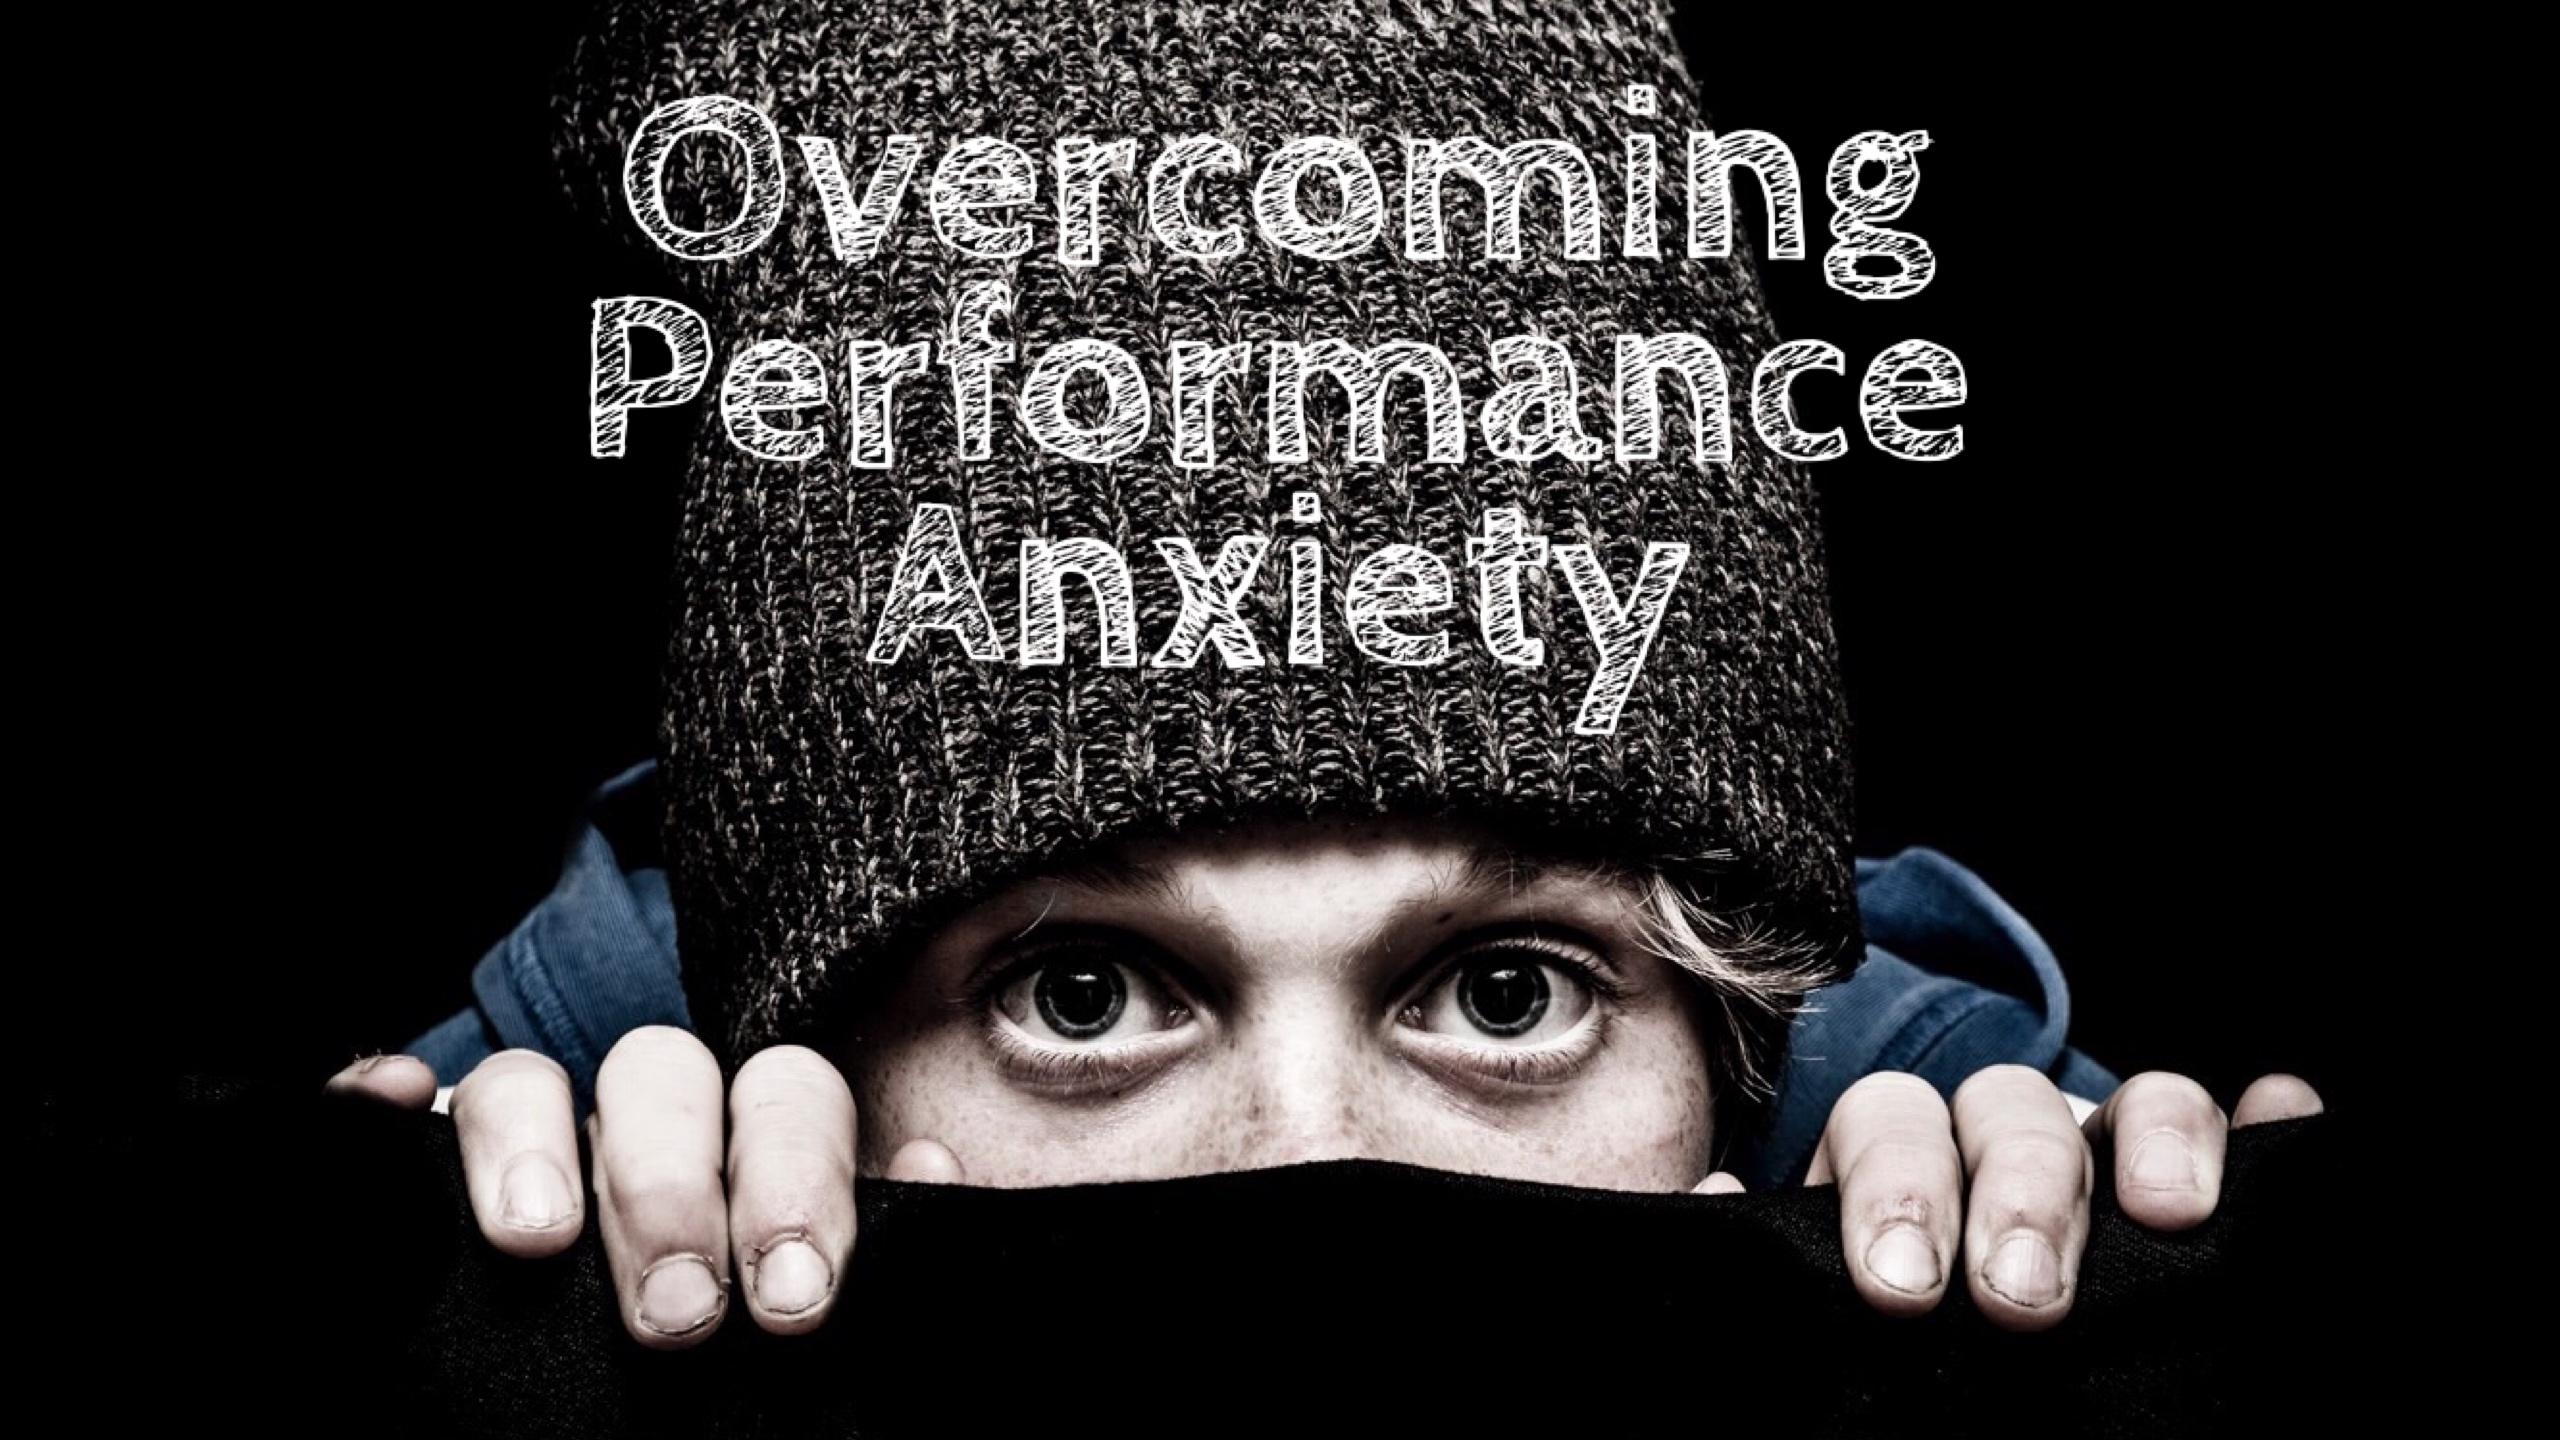 Overcoming Performance Anxiety